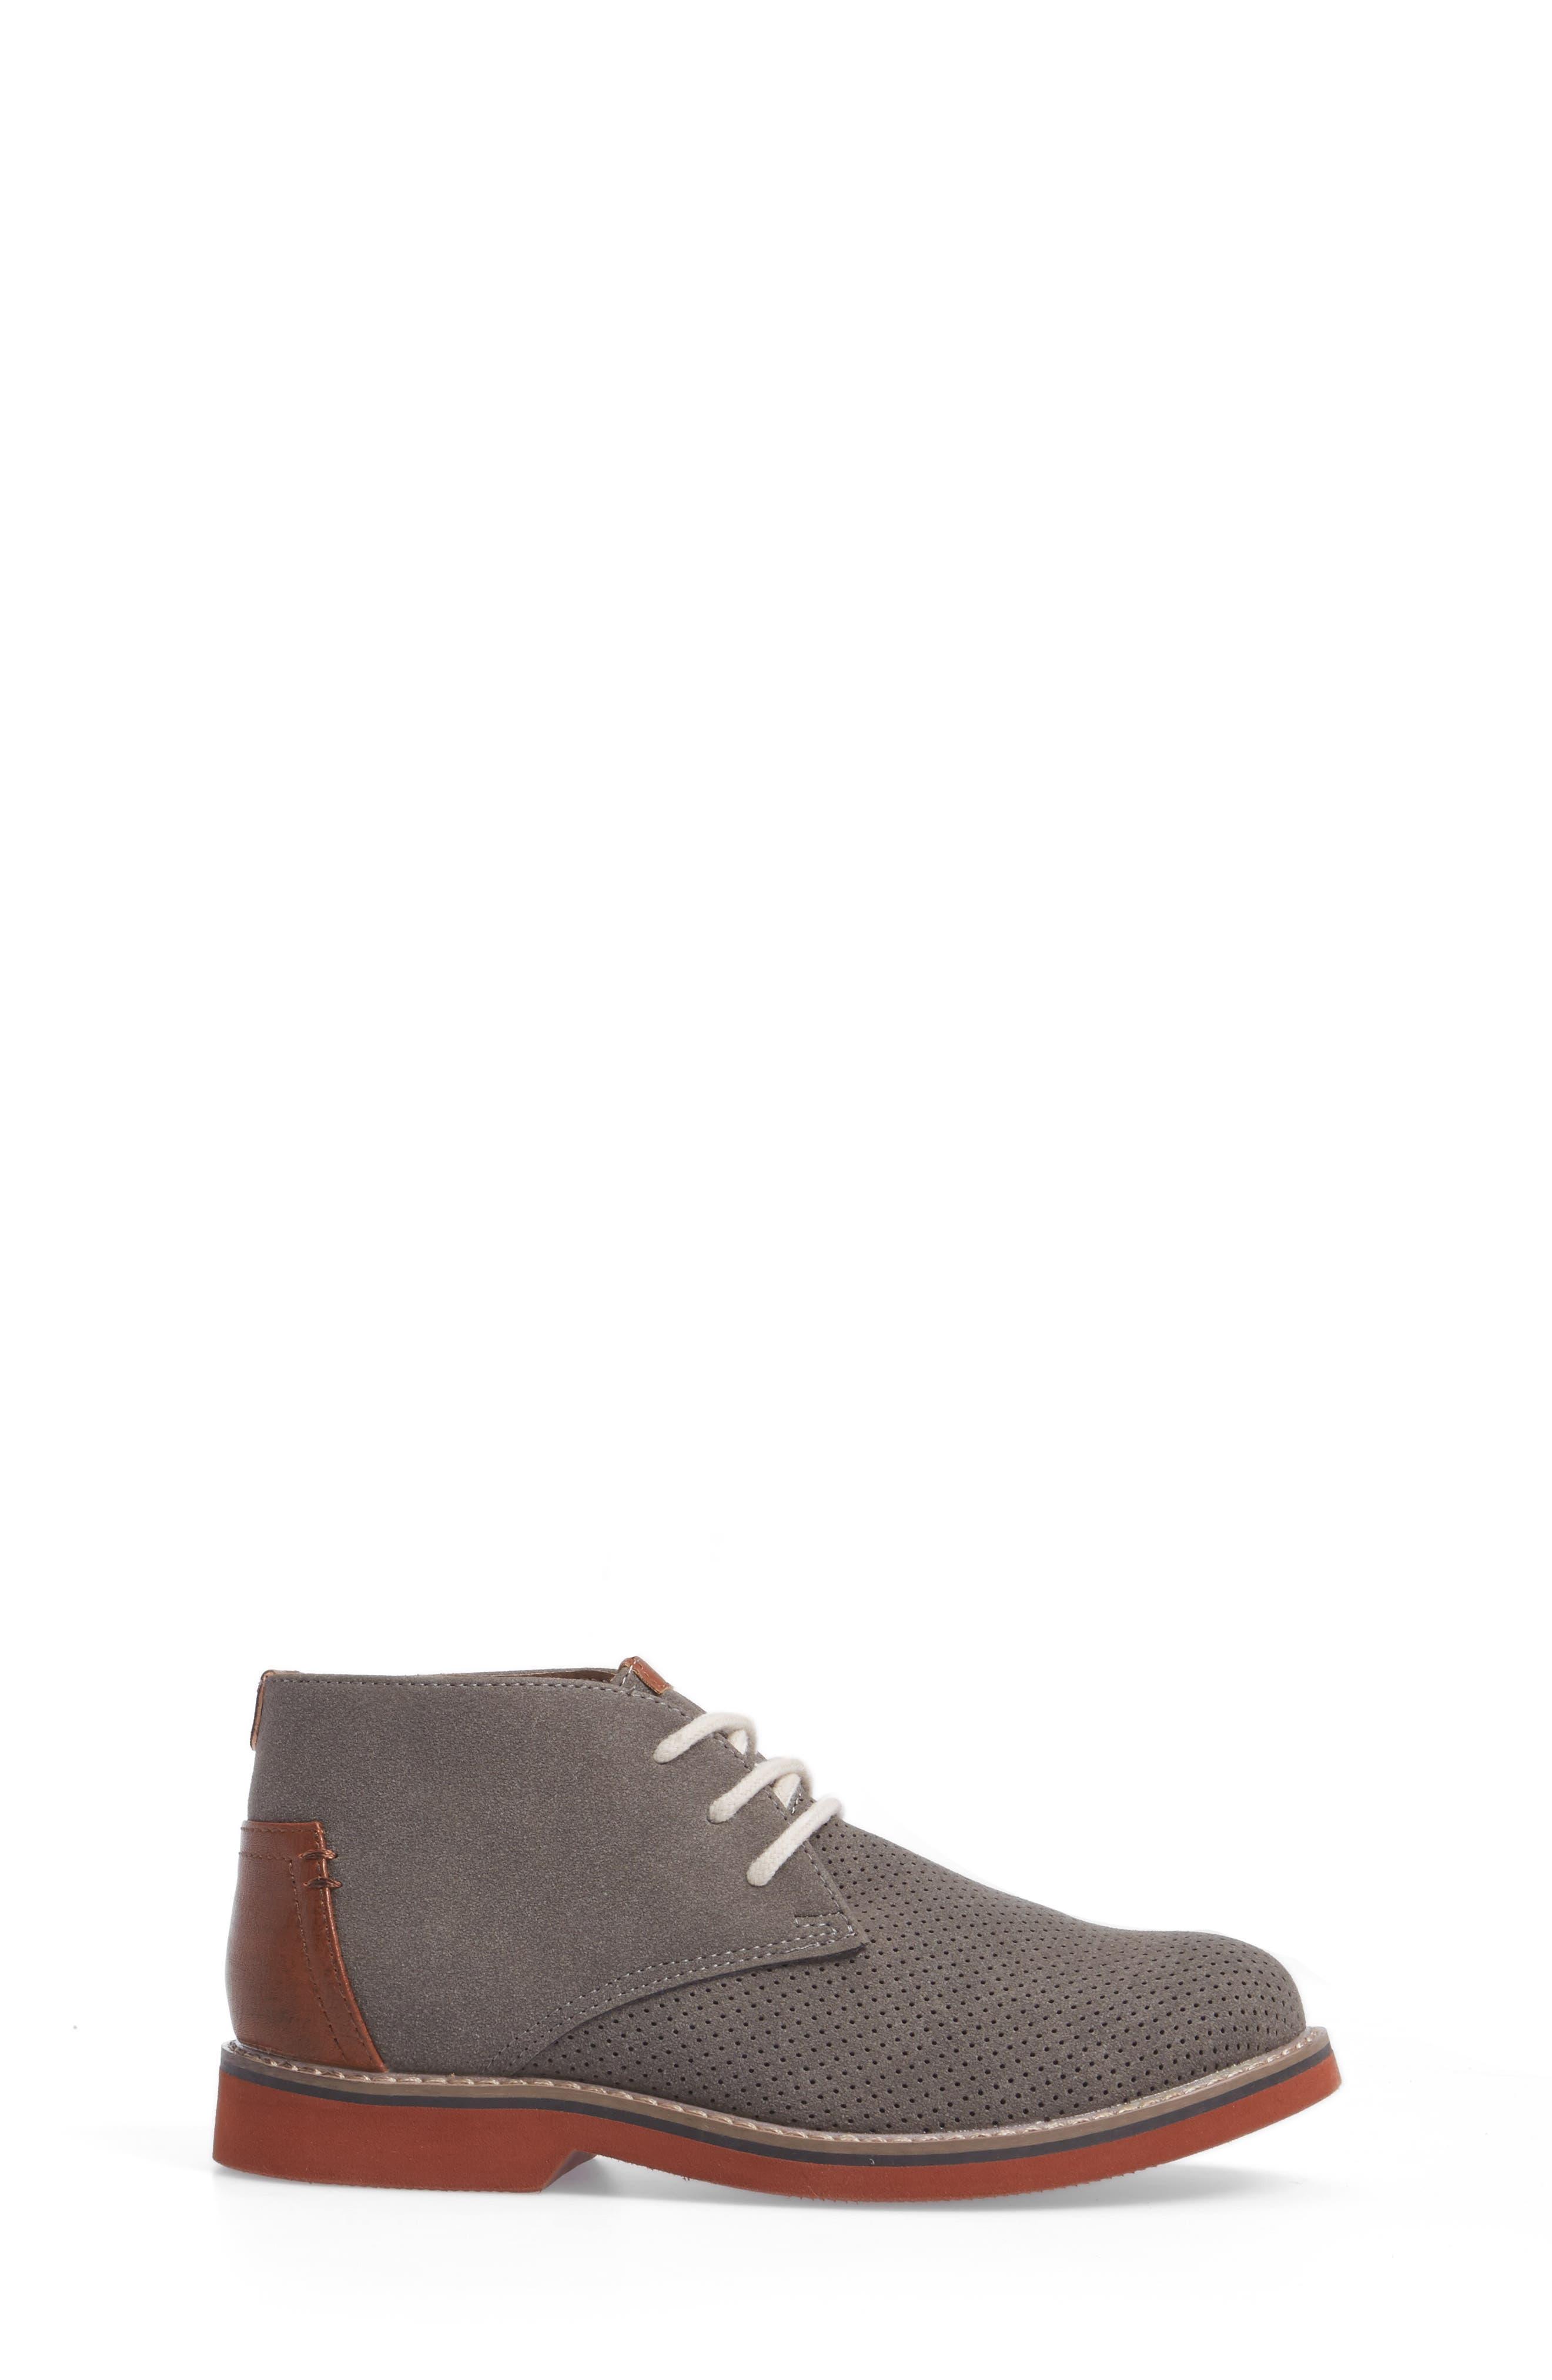 Baden Perforated Chukka Shoe,                             Alternate thumbnail 3, color,                             055